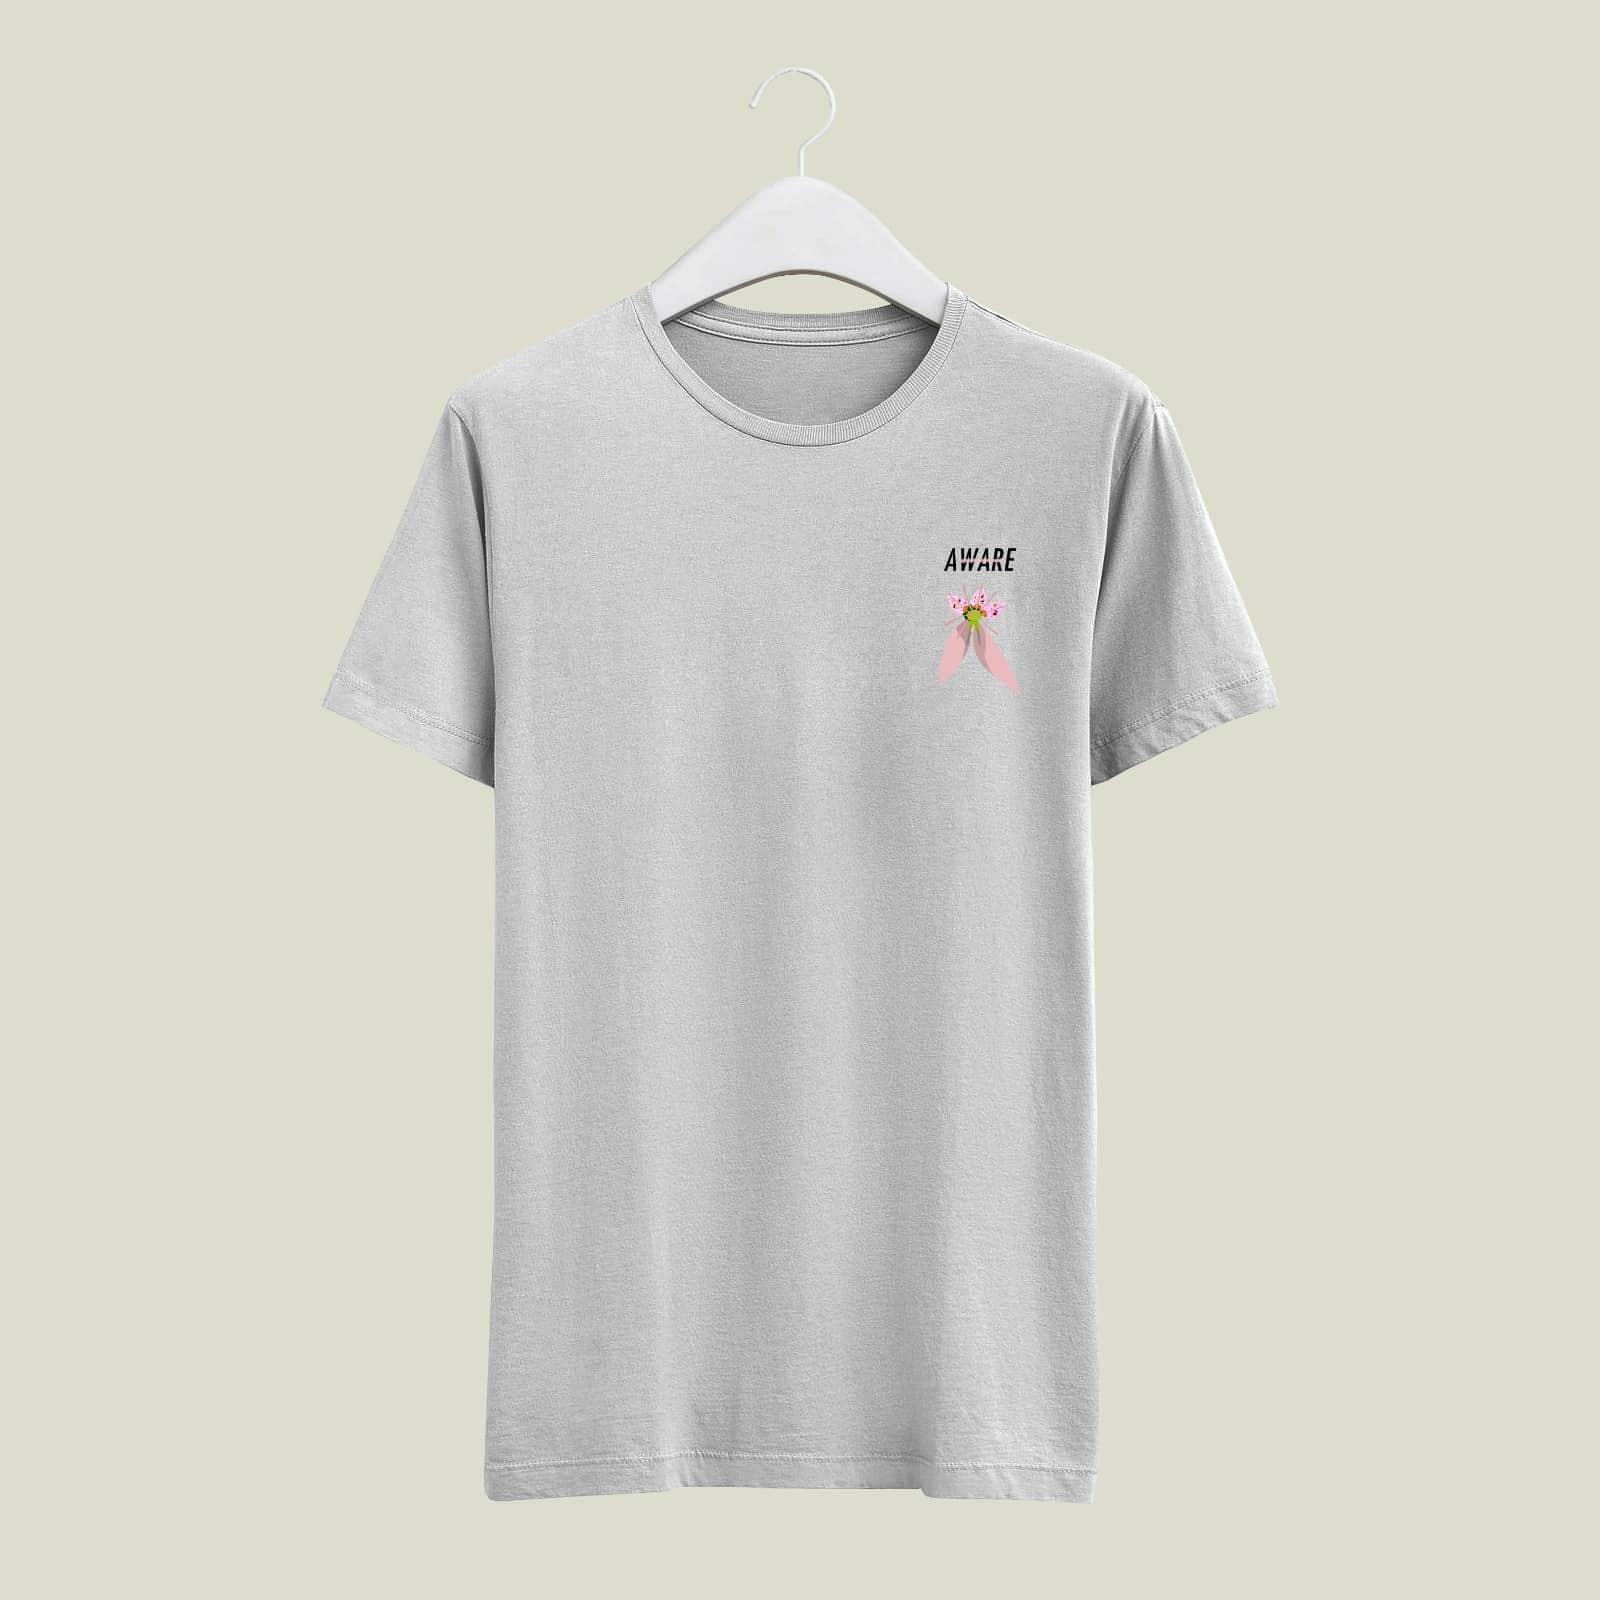 T-Shirt Aware - Bellezza Resistente